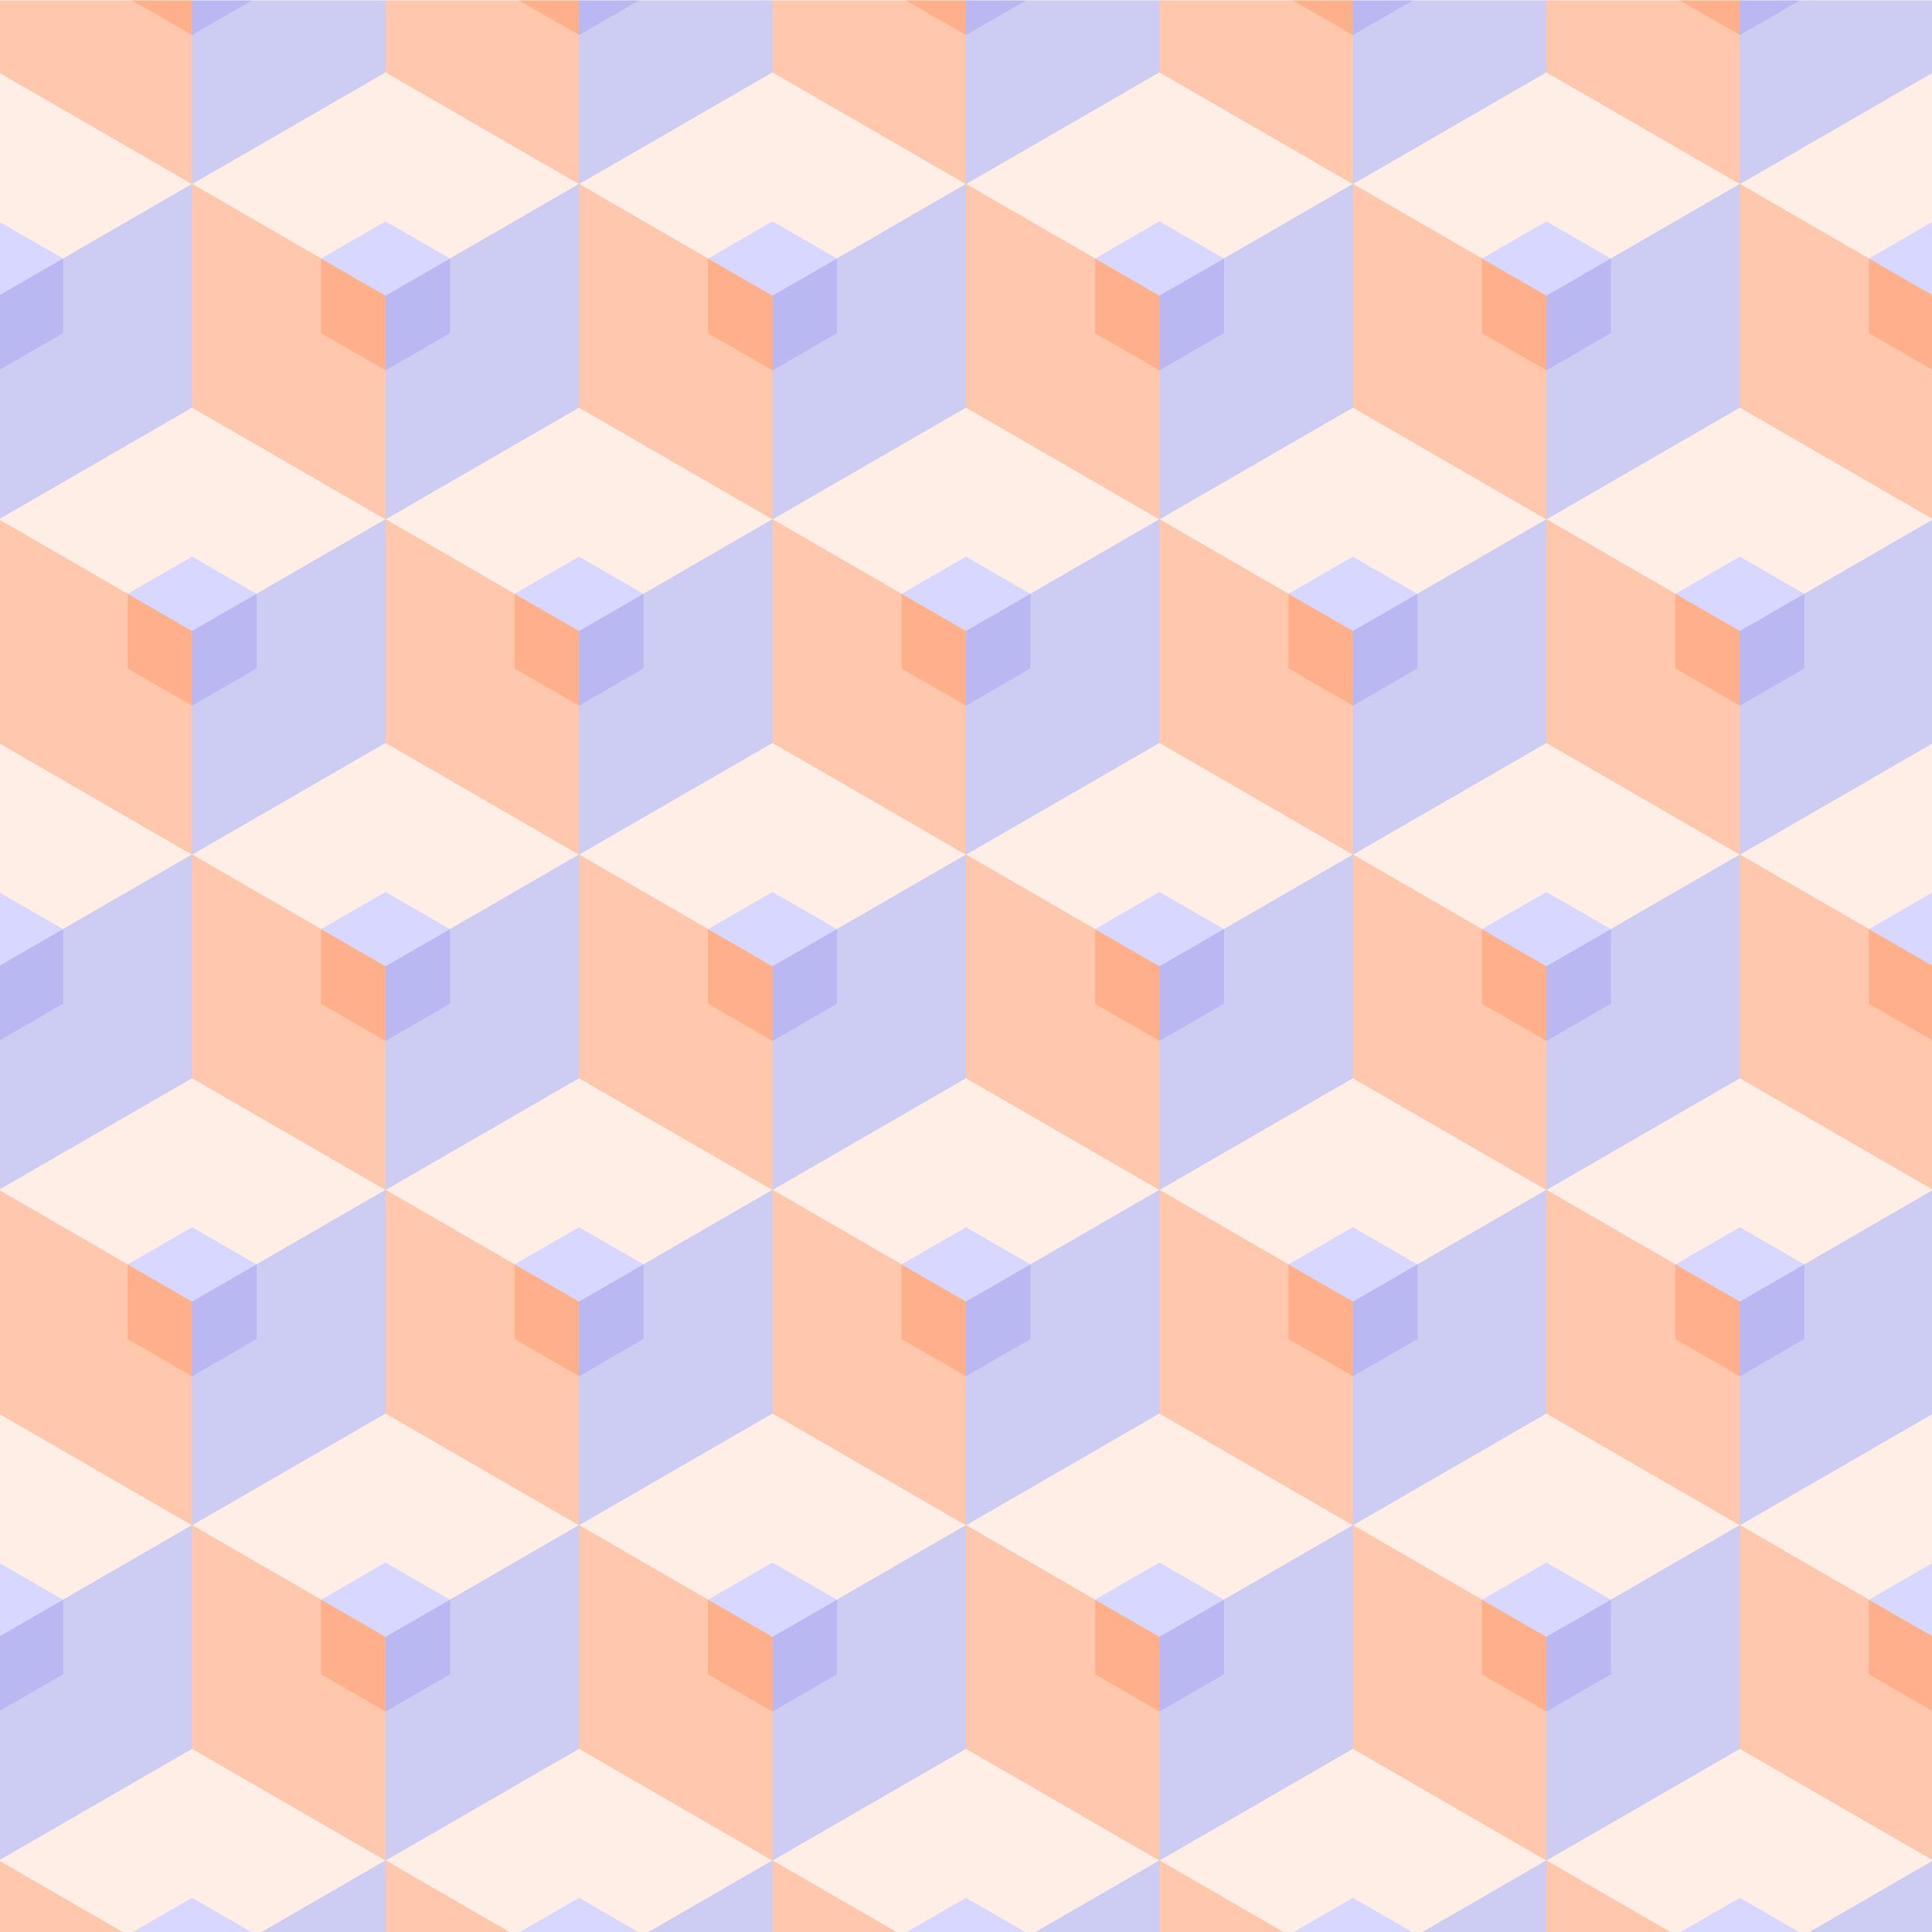 patrón de cubo pastel 3d transparente